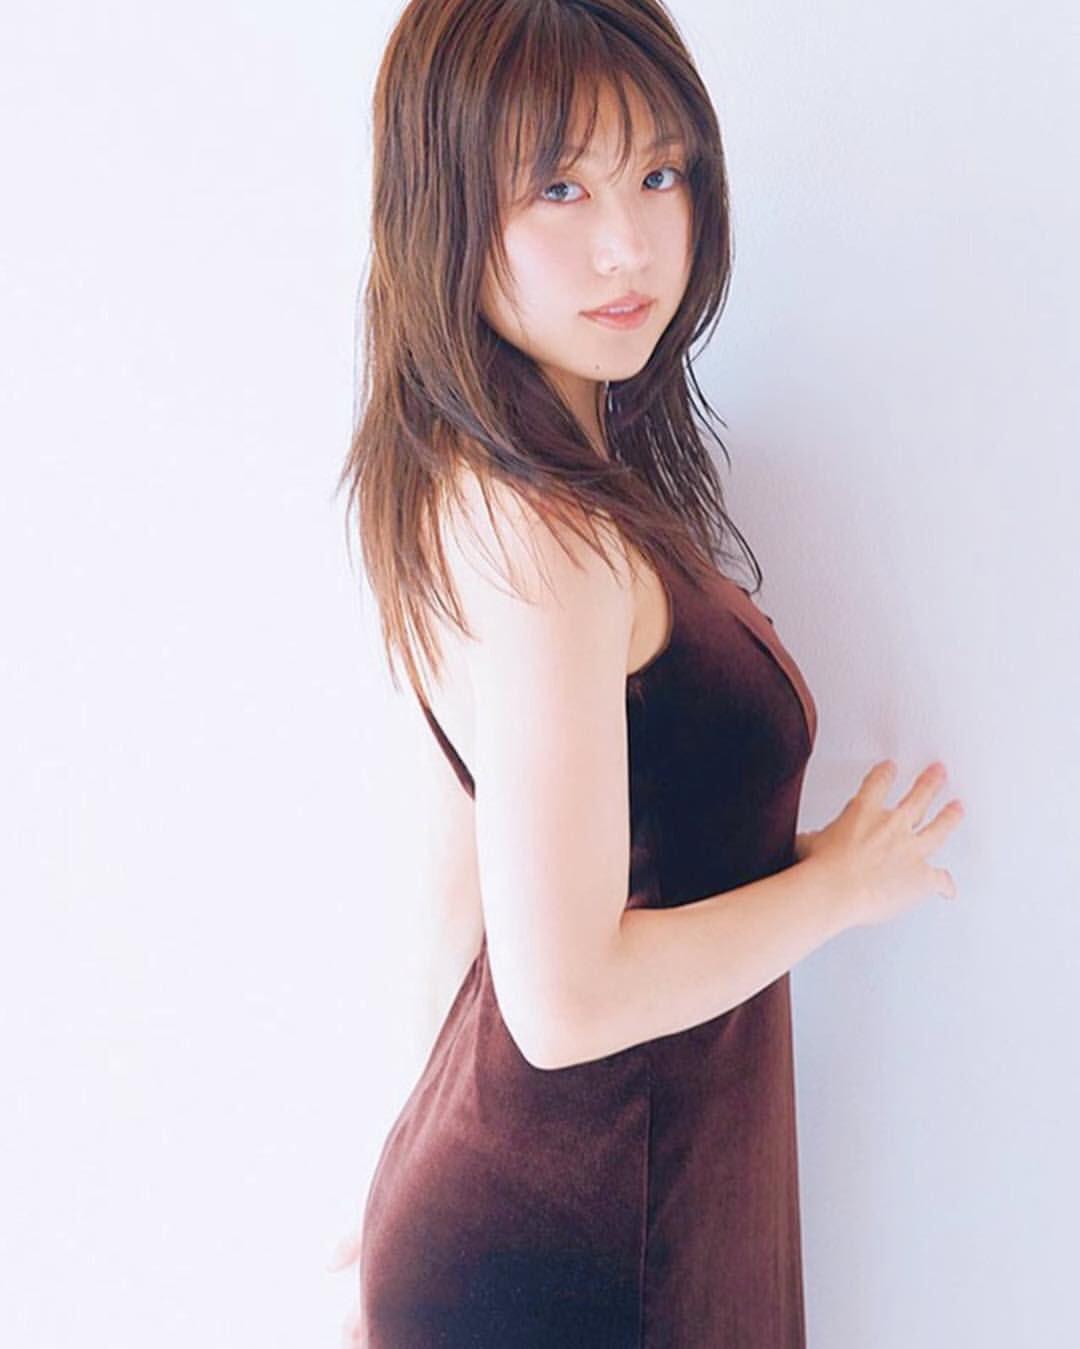 itotii_有村架纯(有村架純、ありむら かすみ、Arimura Kasumi)